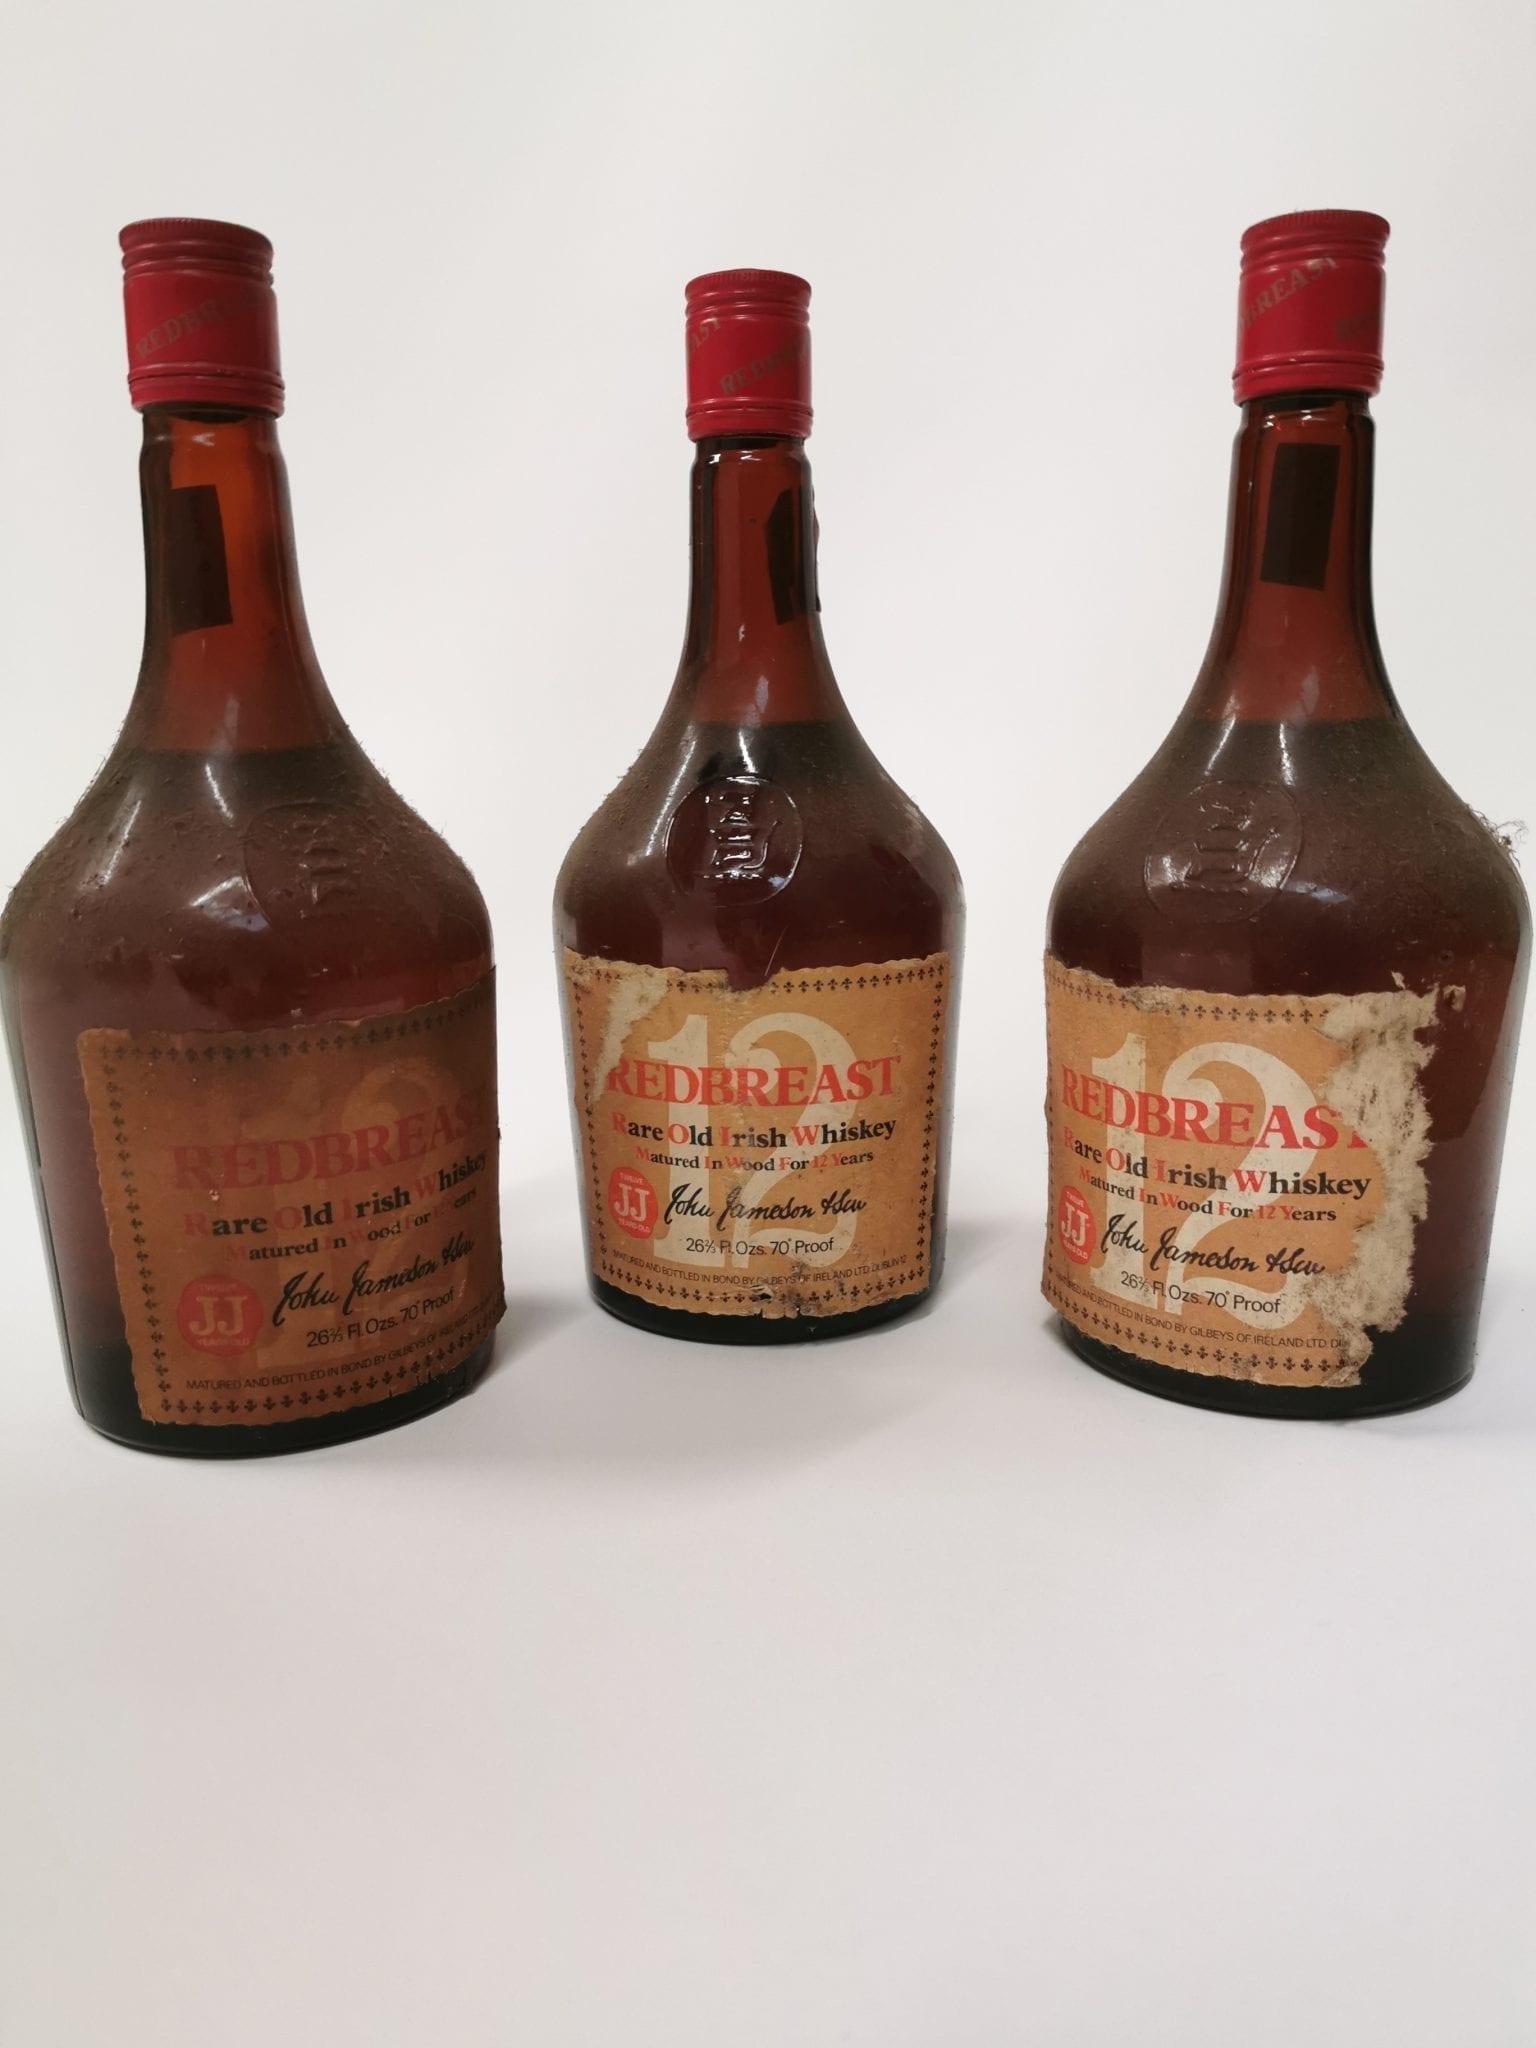 irish whiskey memorabilia, redbreast irish whiskey gilbeys